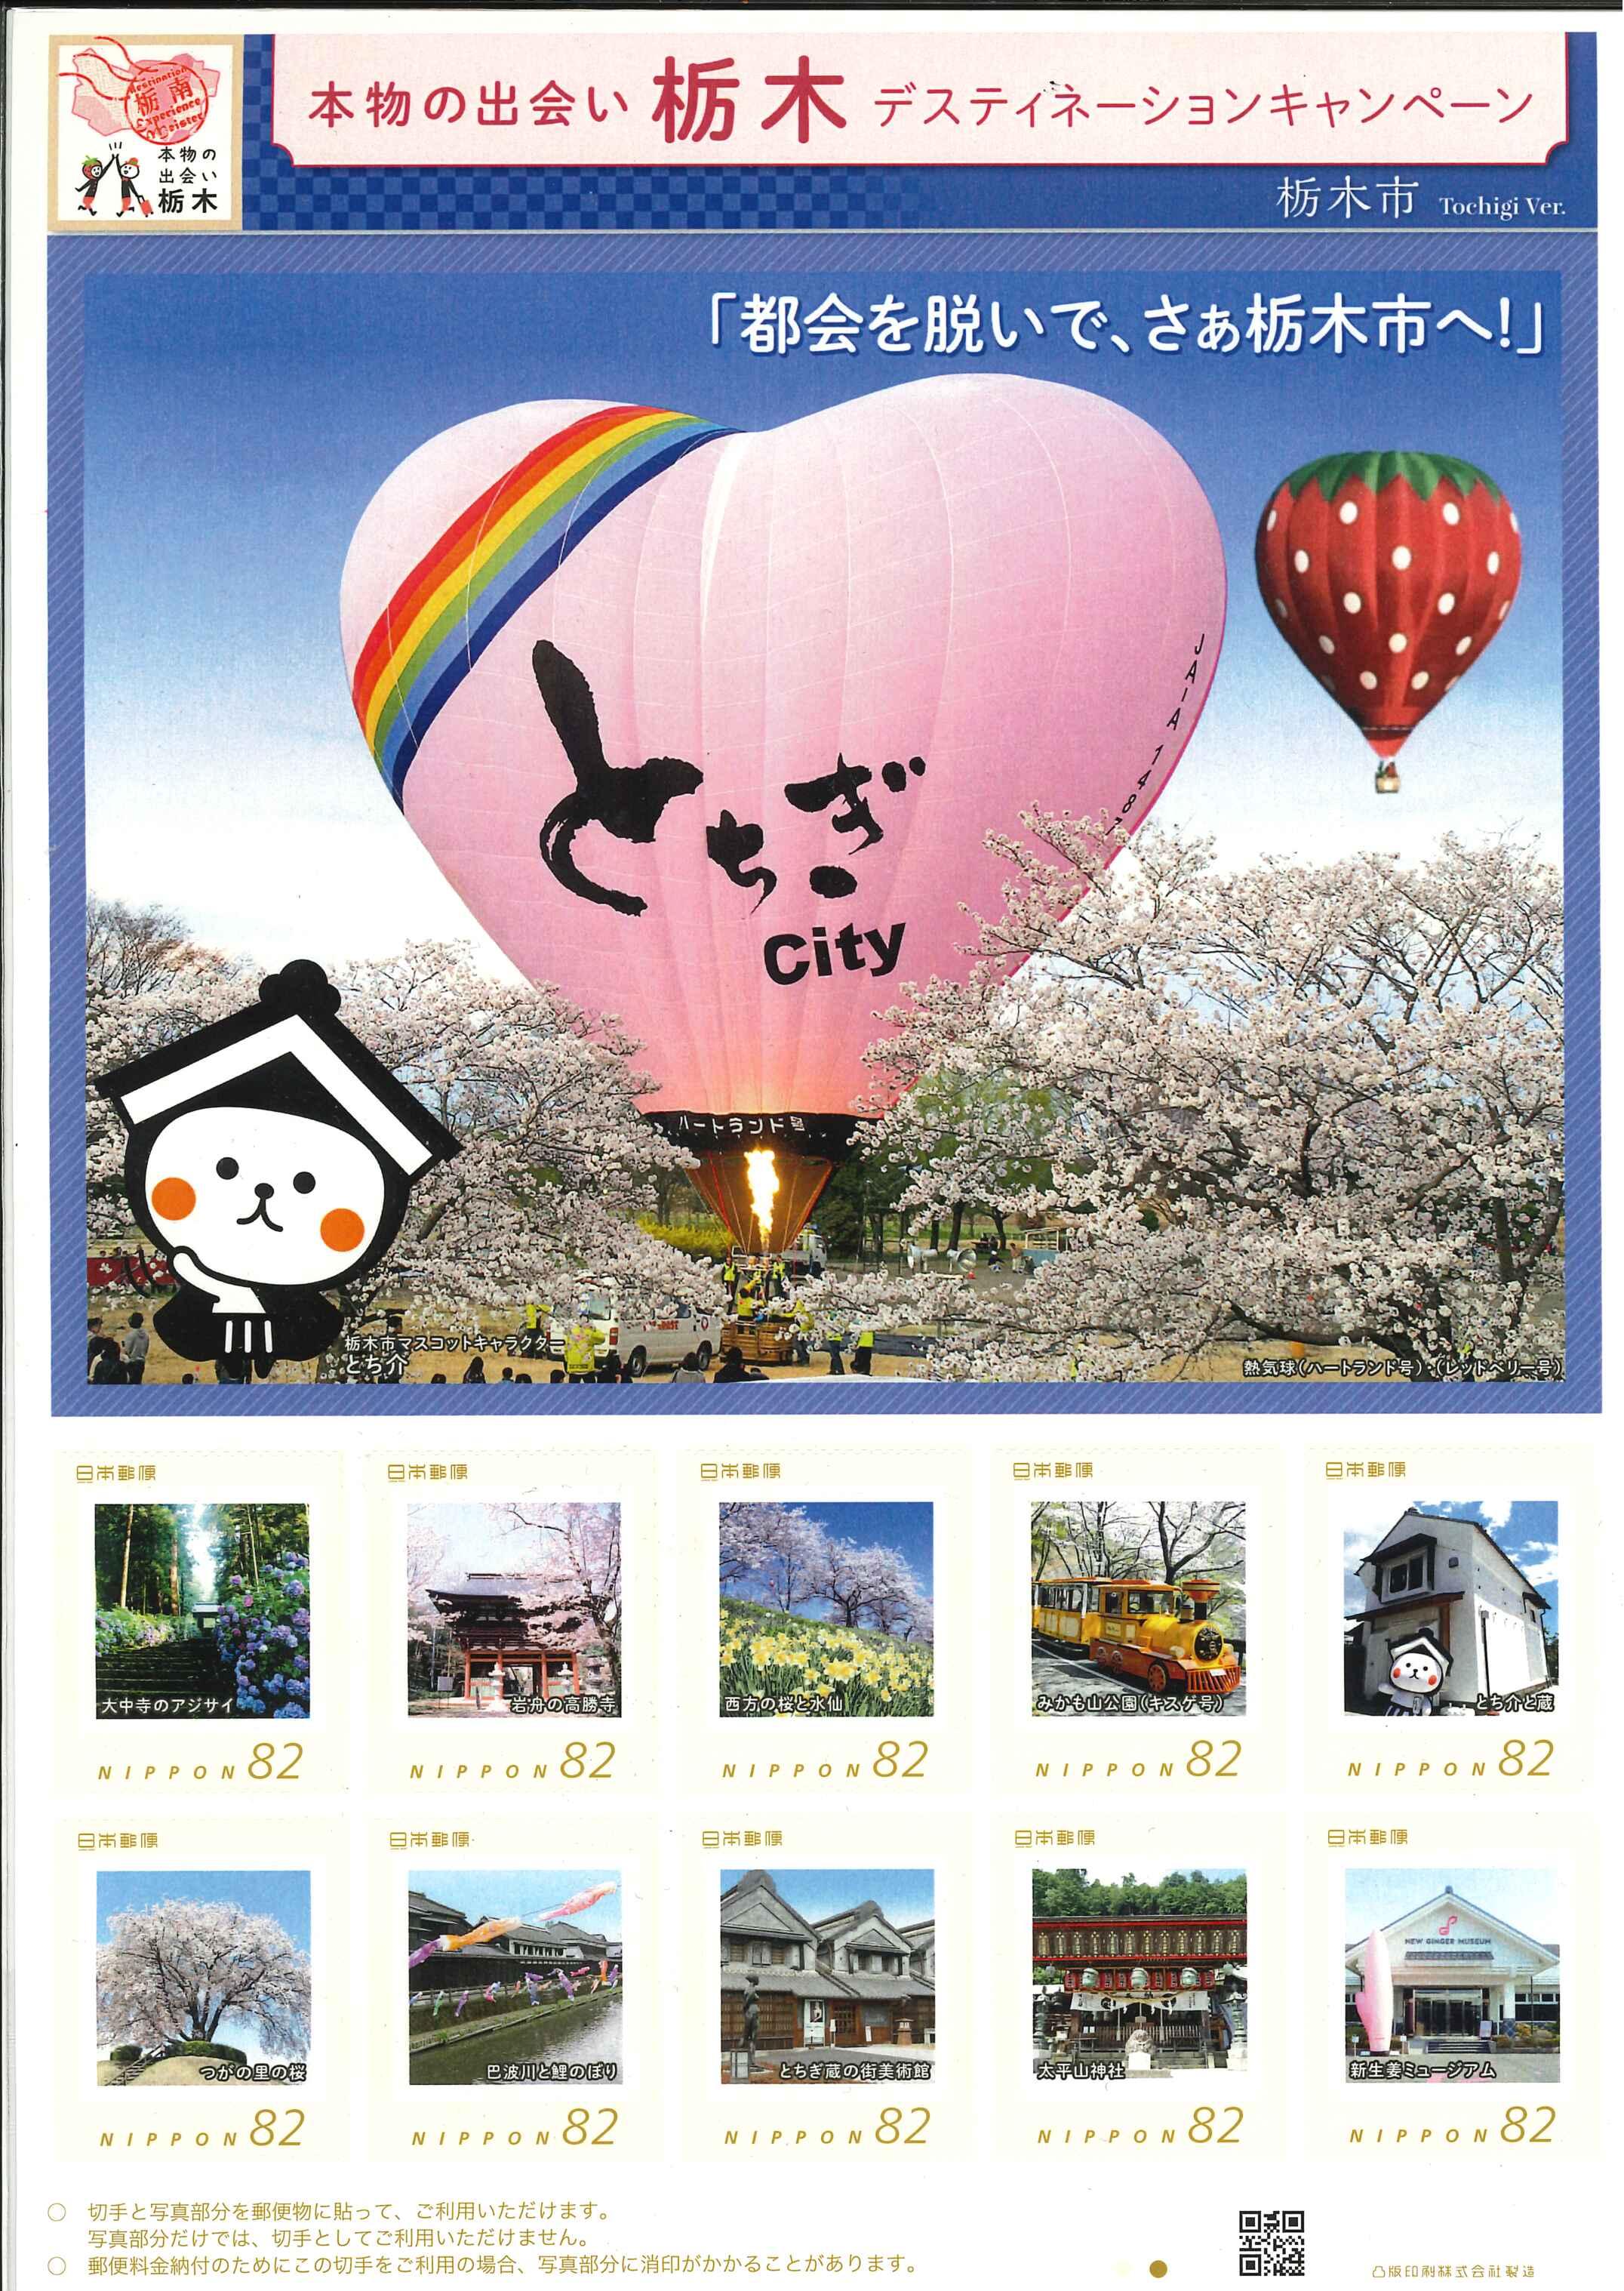 http://www.tgh.co.jp/contents/news/20180603171232577_0001.jpg